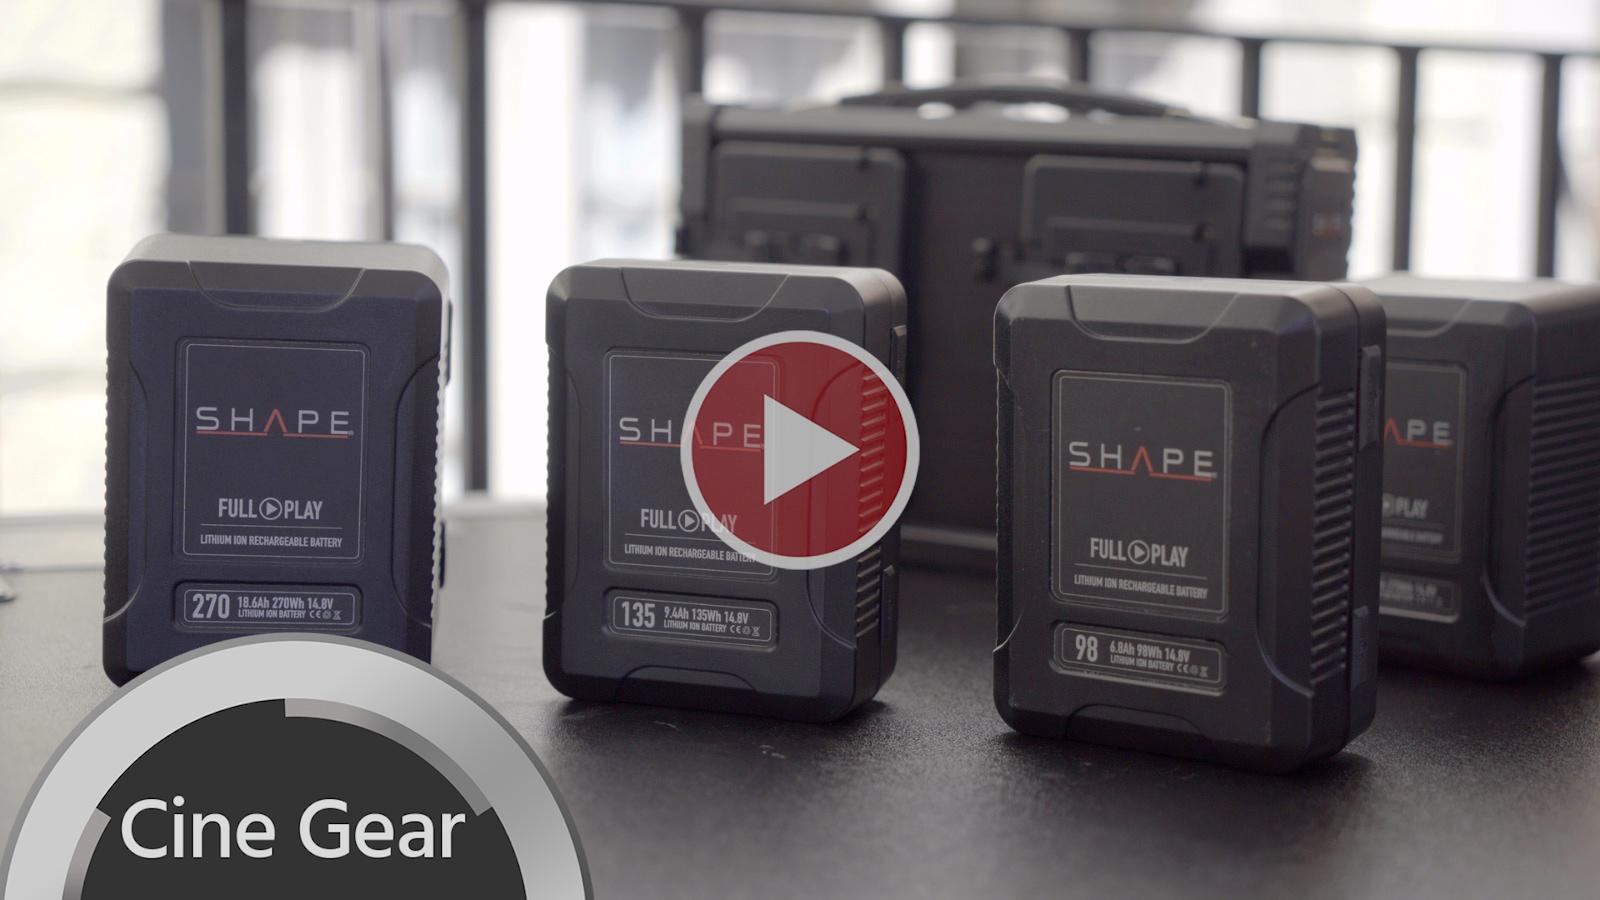 SHAPEがFull PlayバッテリーをCine Gear2018に出展